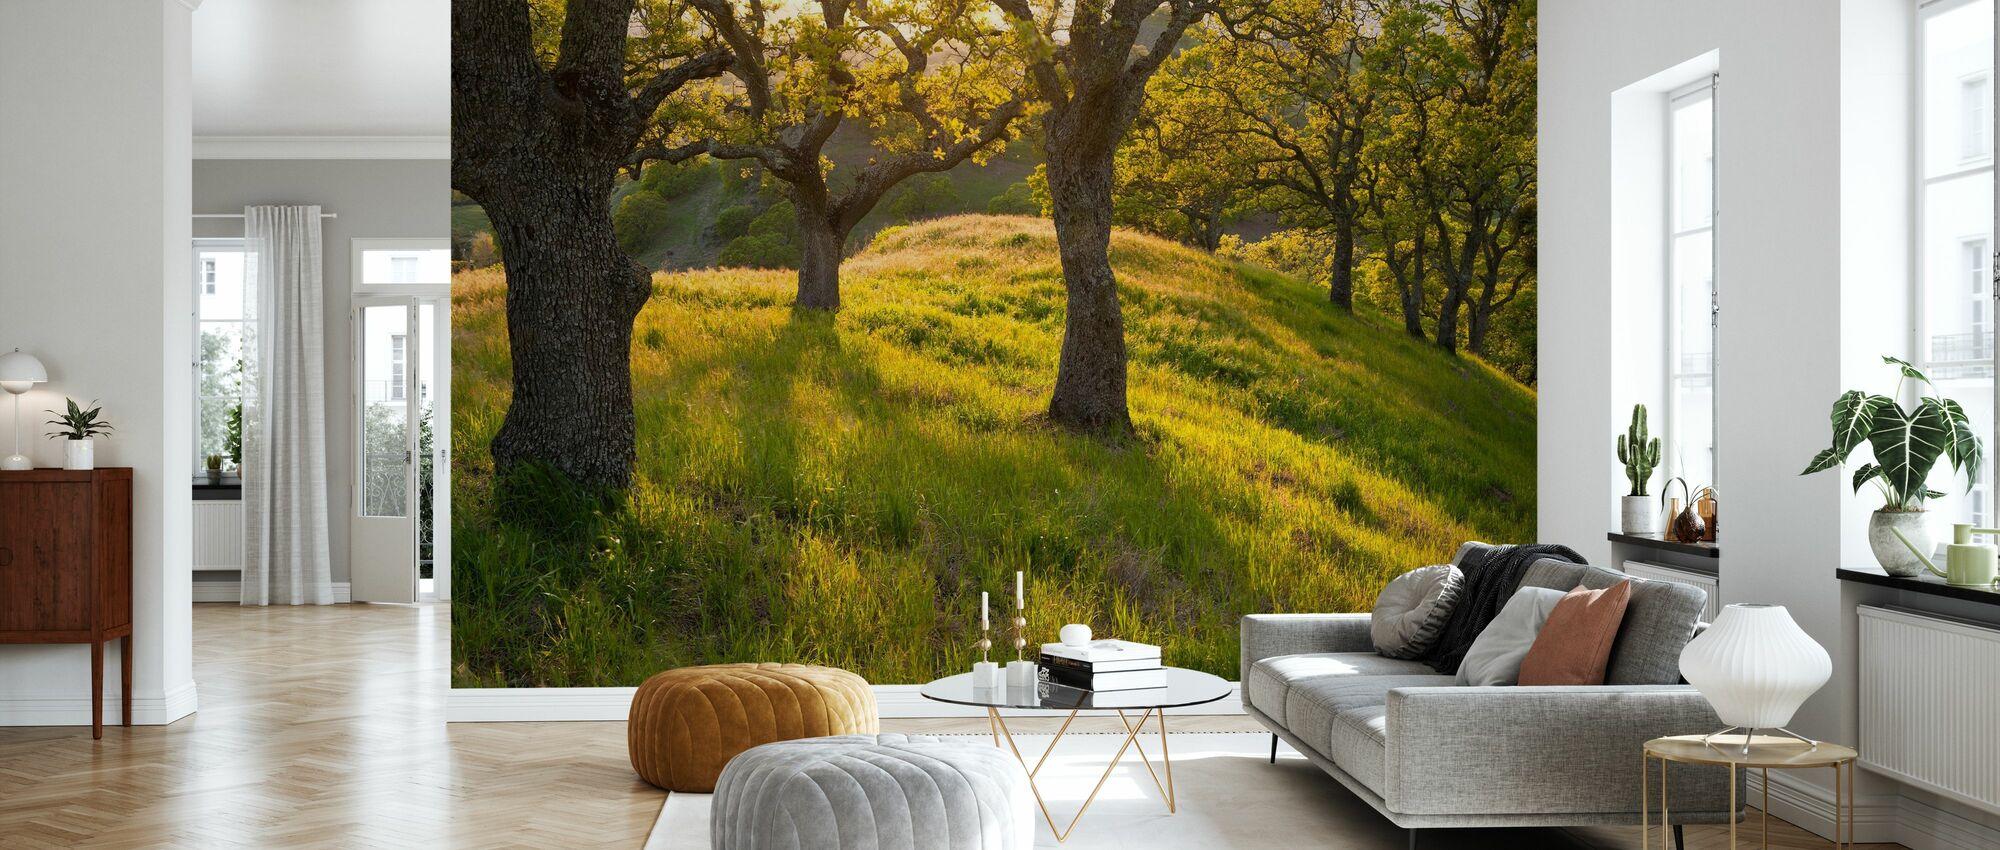 Late Afternoon Sunshine Streams, Mount Diablo, California - Wallpaper - Living Room